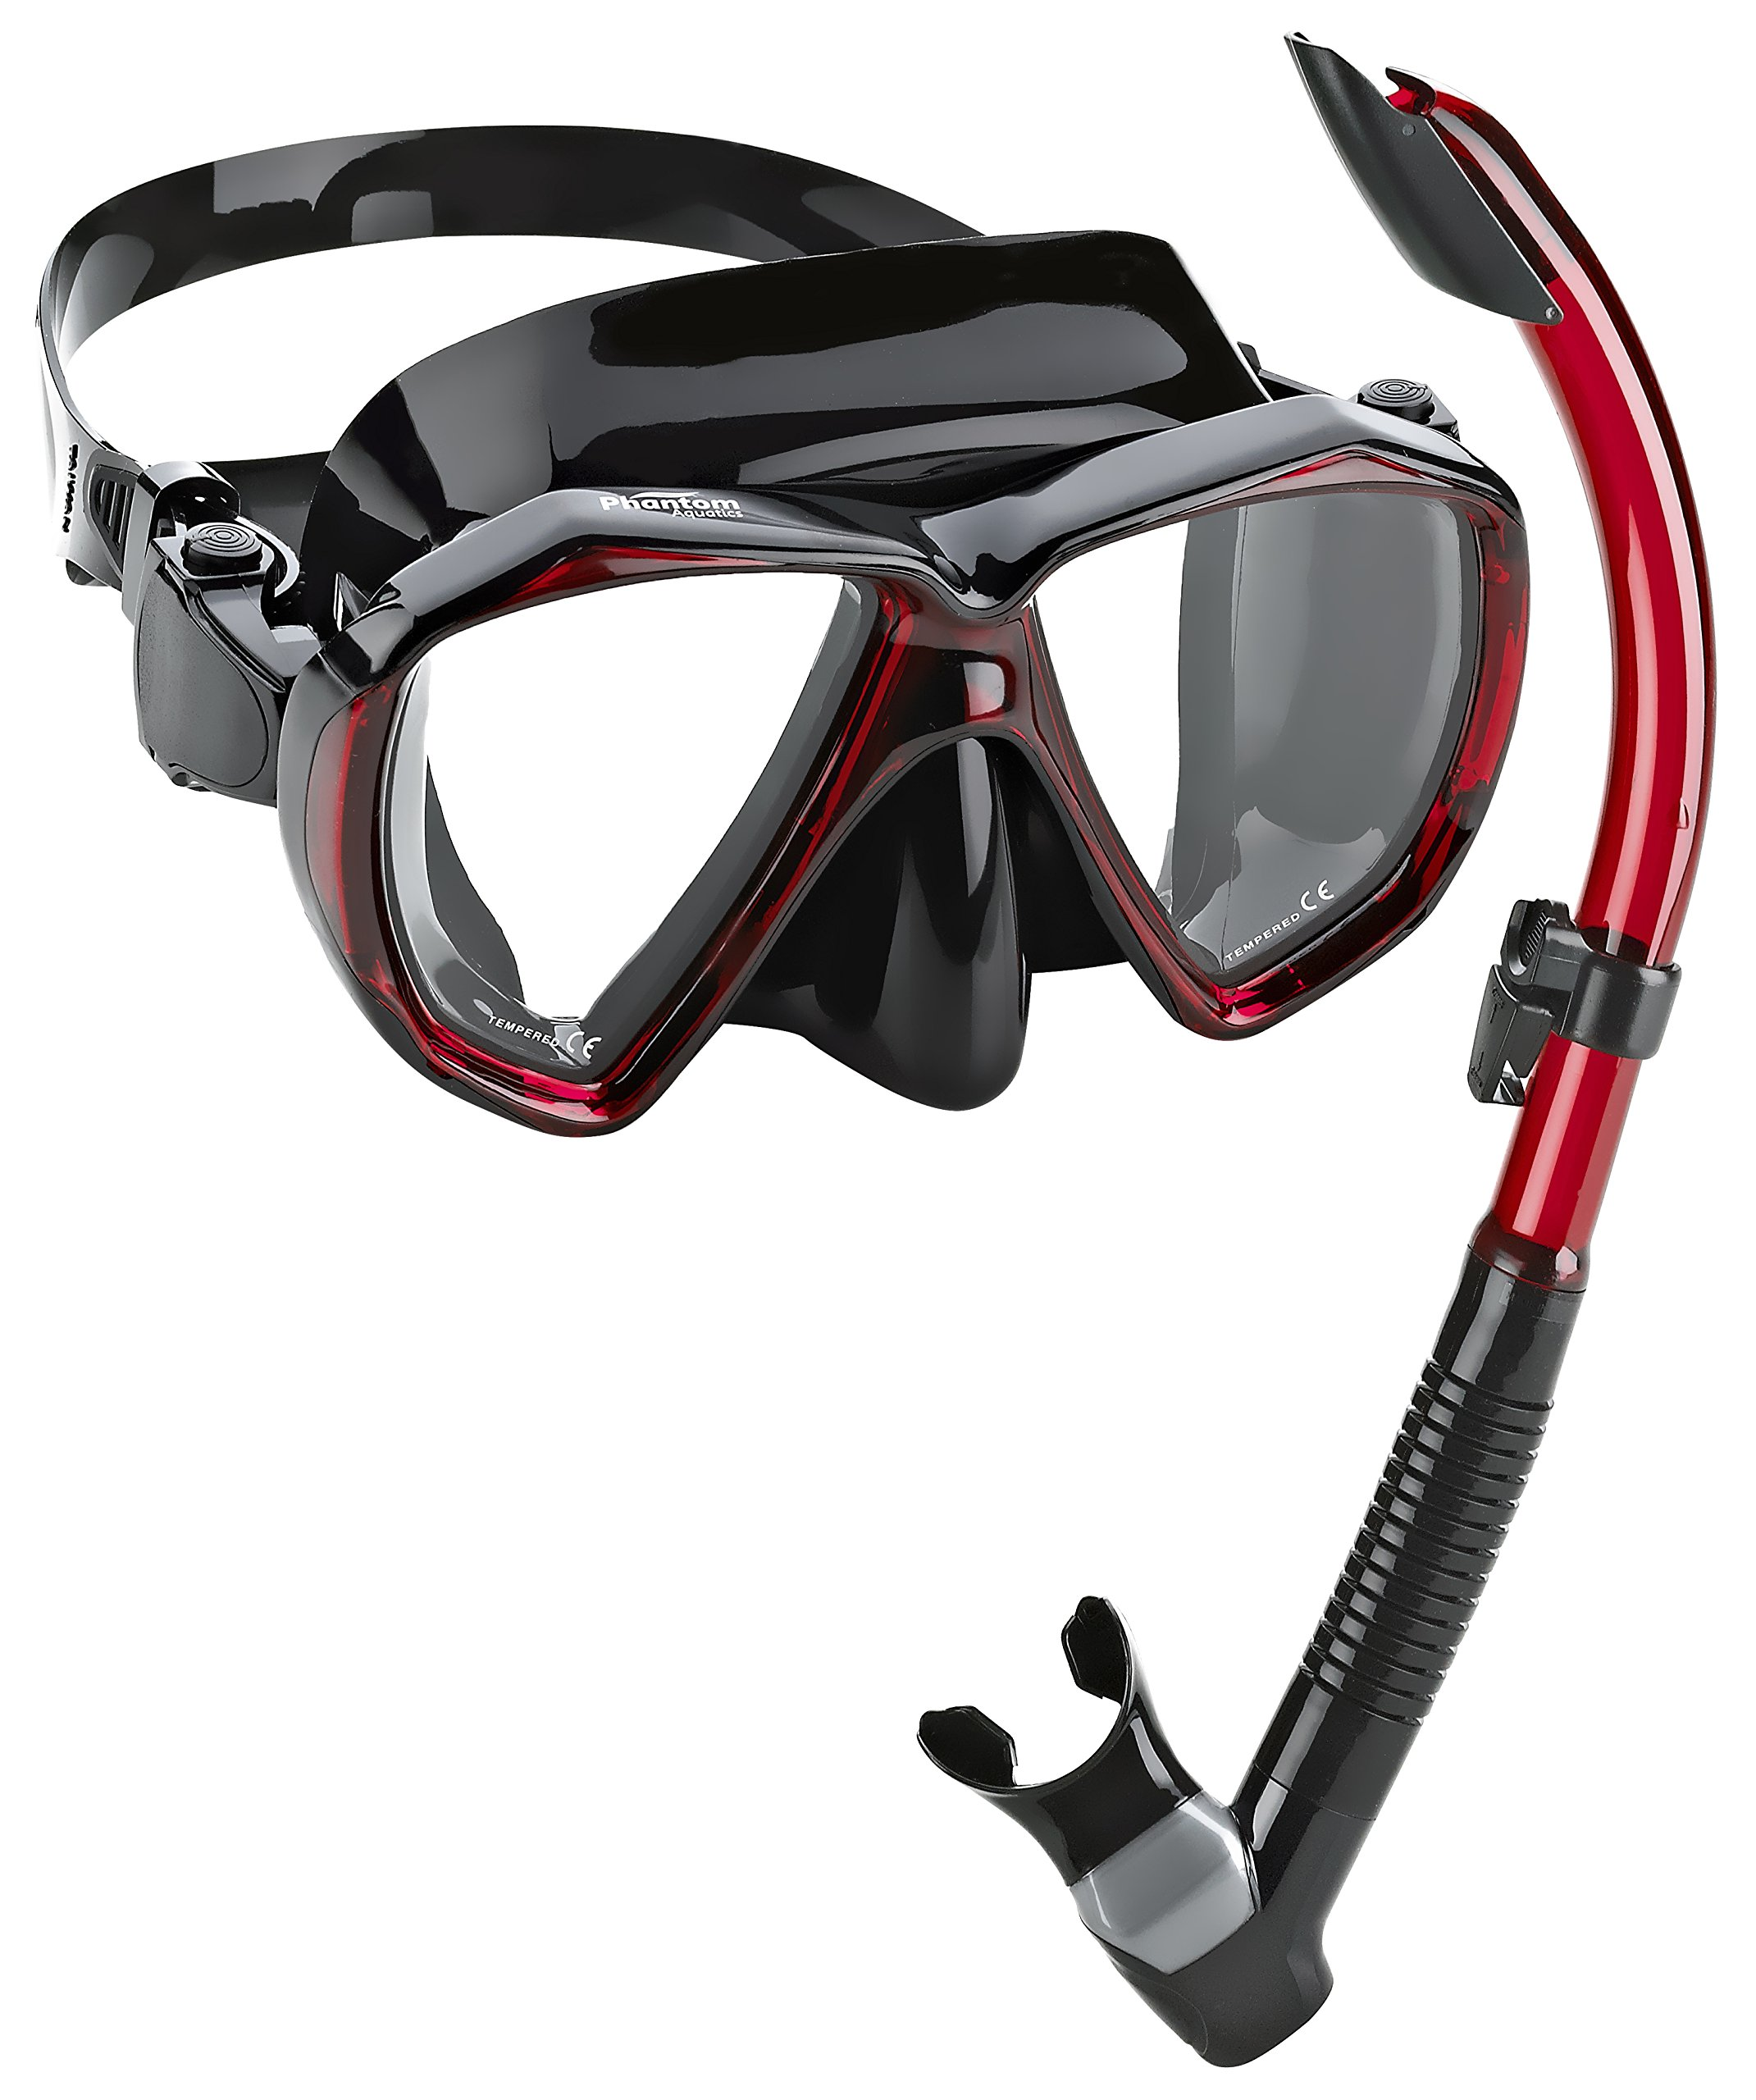 Phantom Aquatics Velocity Scuba Snorkeling Mask Snorkel Set by Phantom Aquatics